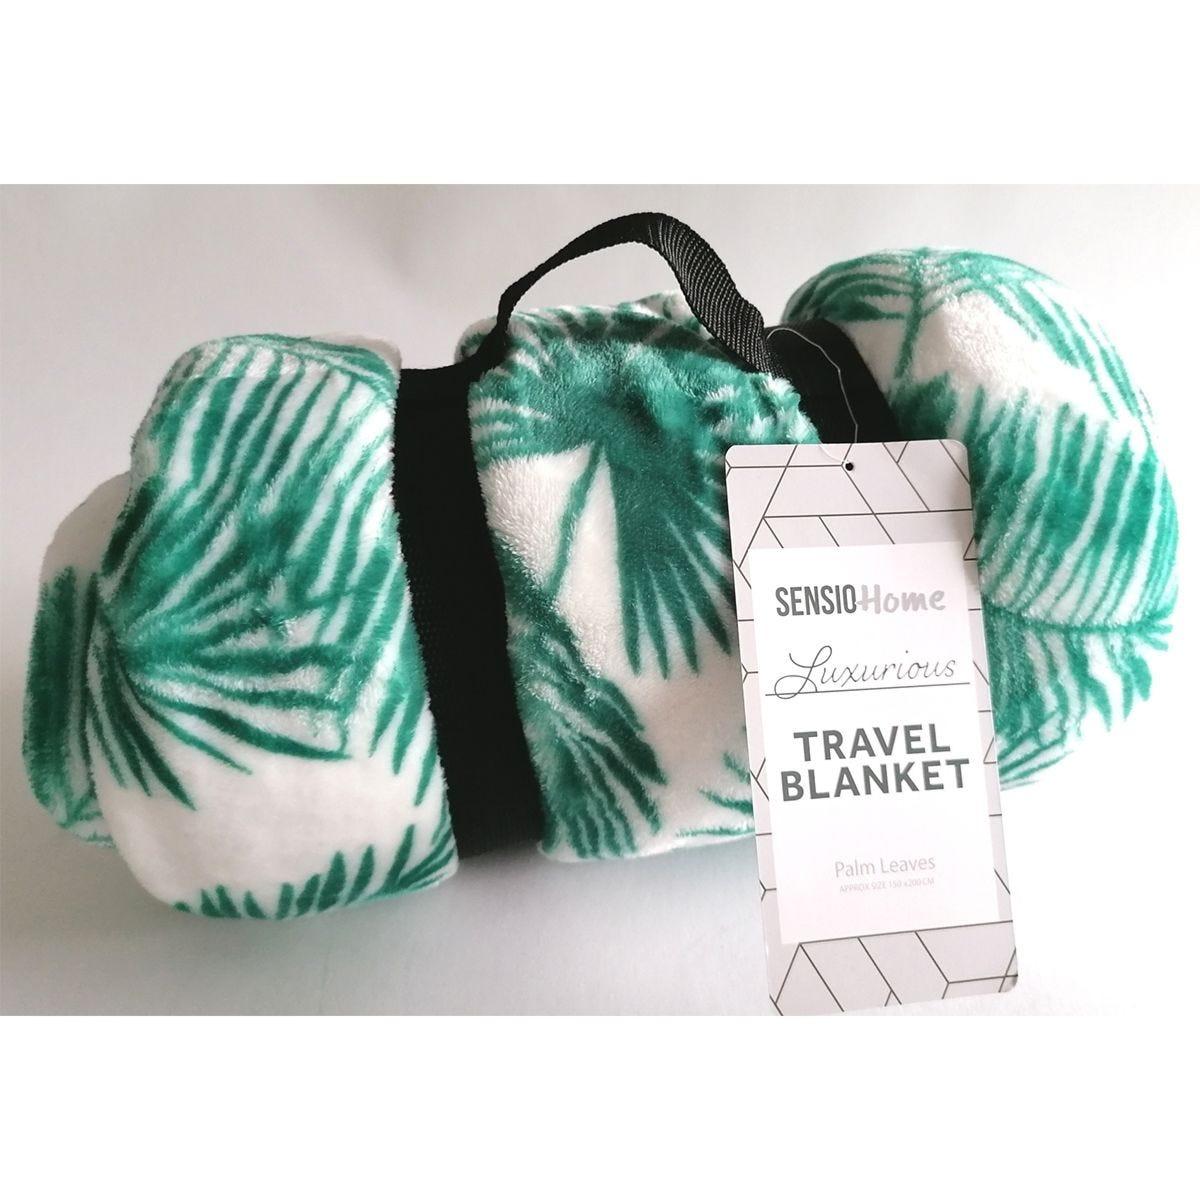 Sensio Travel Blanket - Palm Leaves